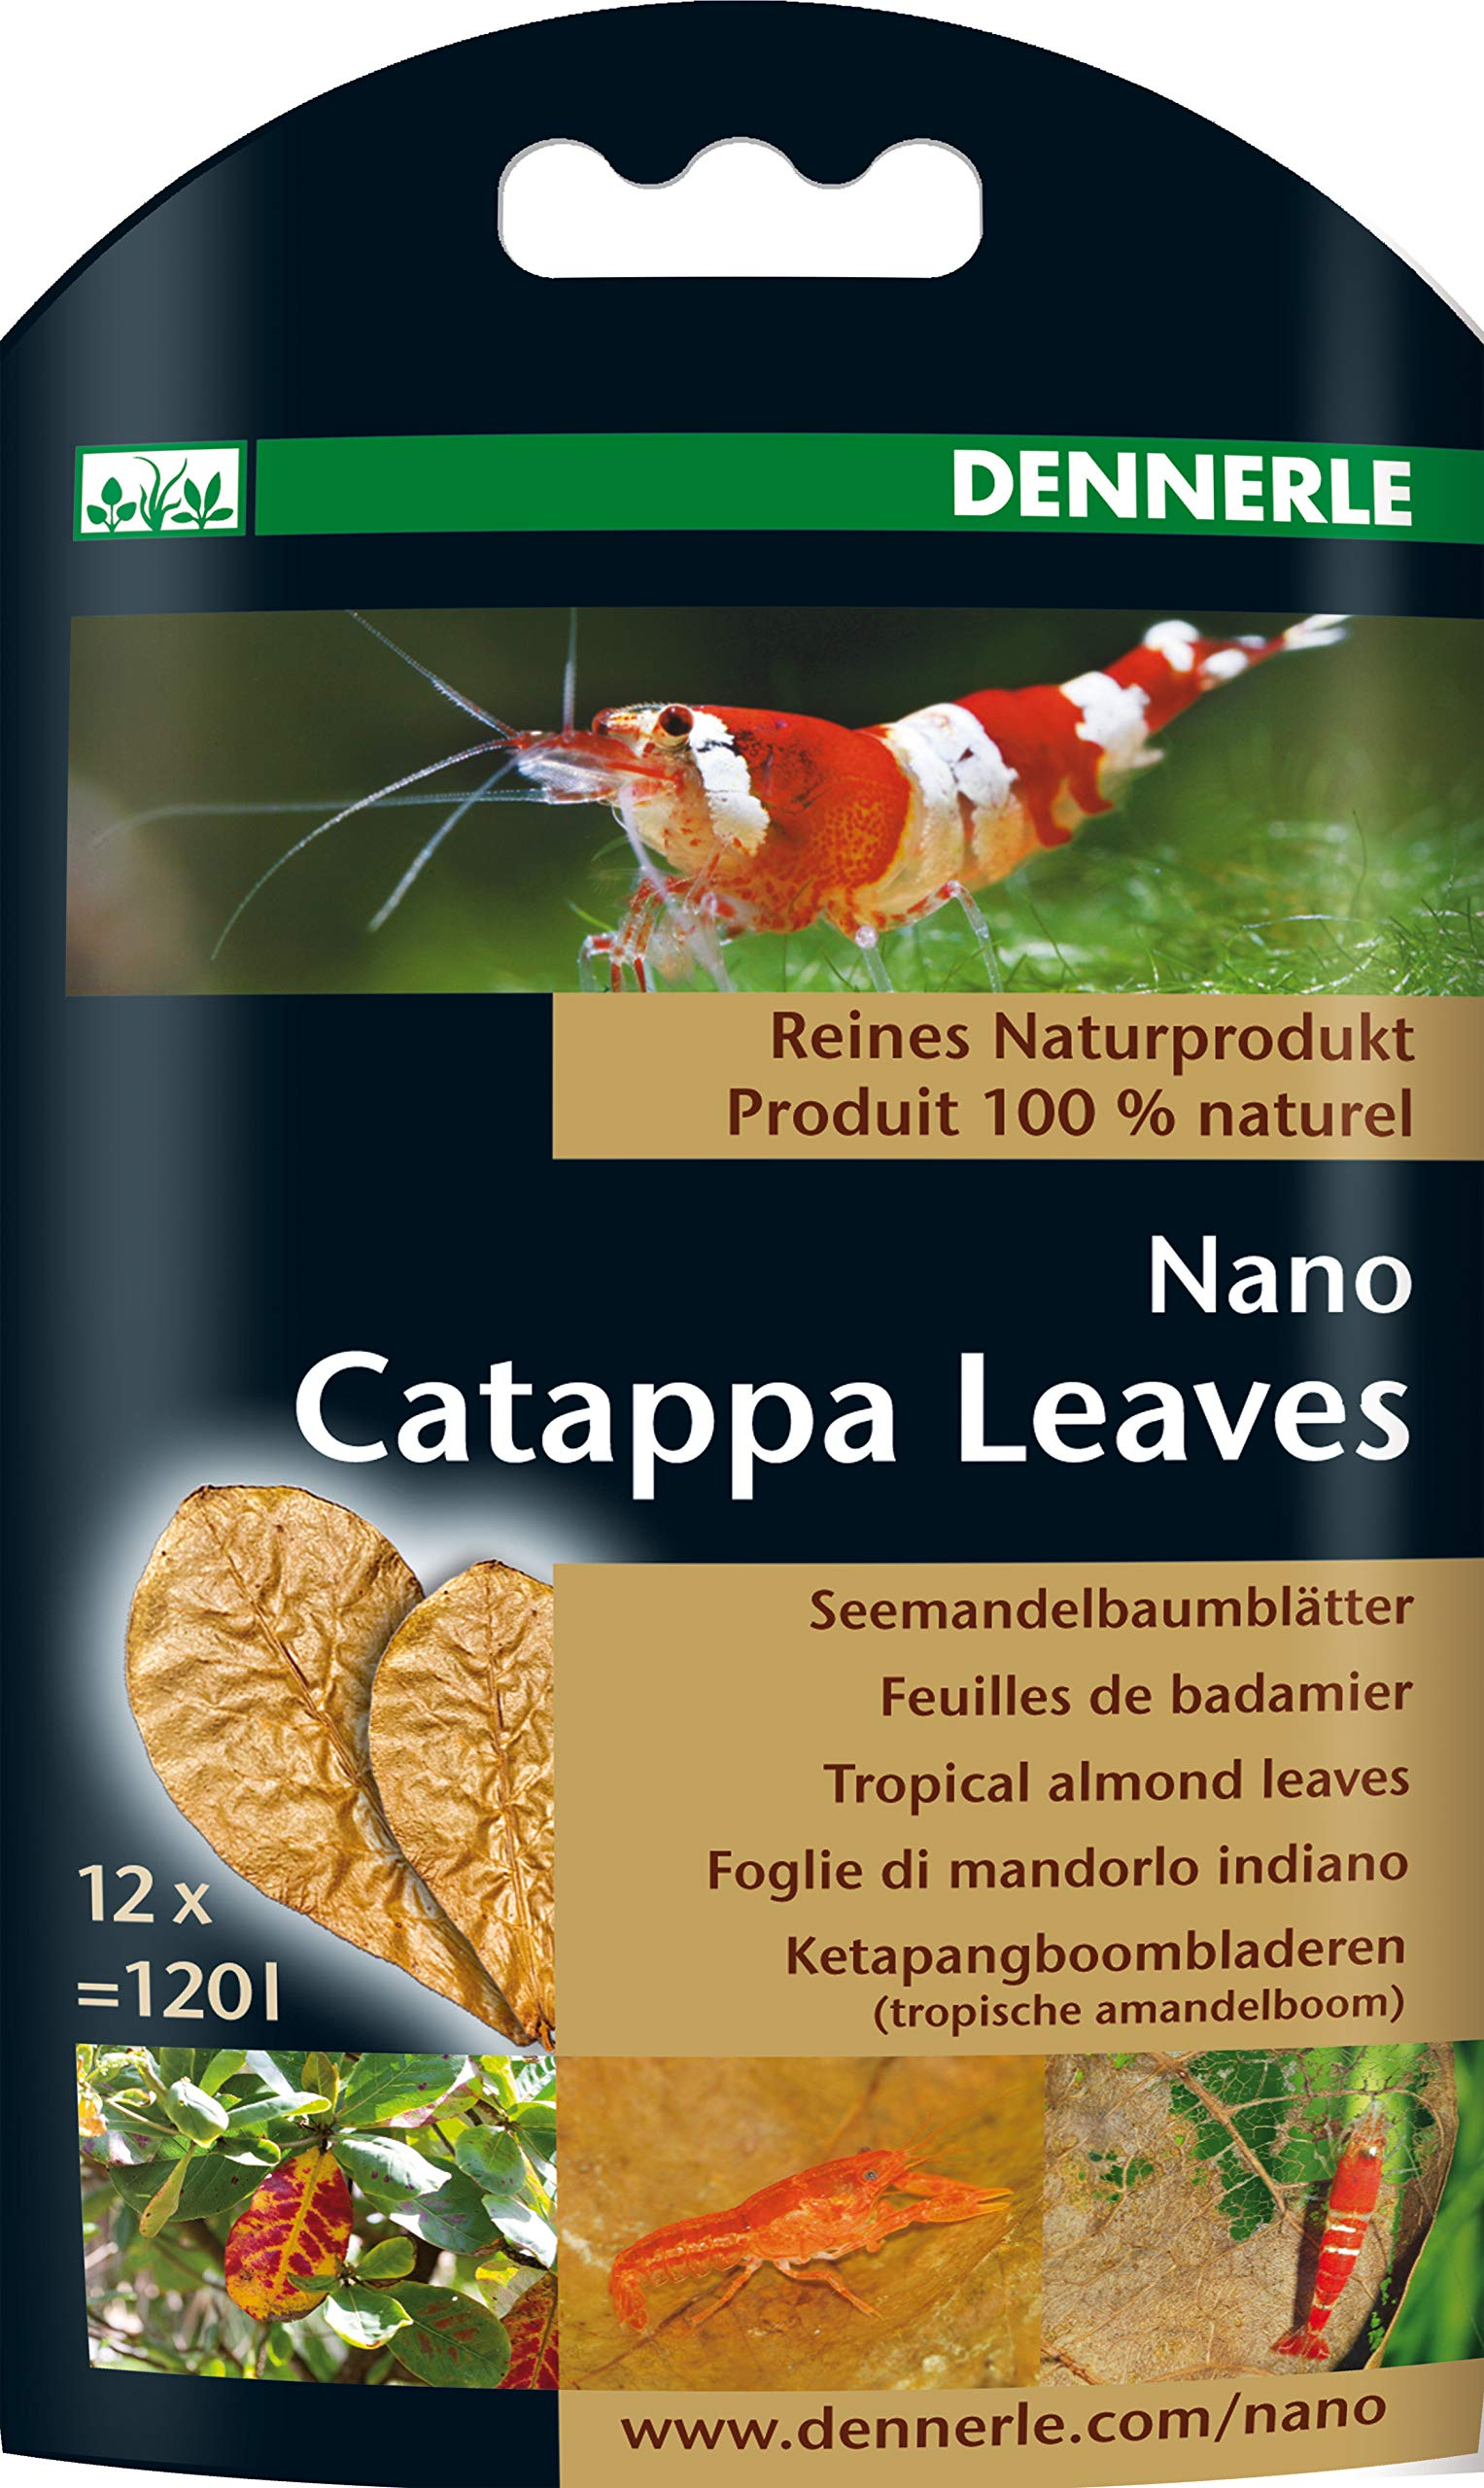 Dennerle Nano Catappa Leaves - 12 pcs, Brown (5916)